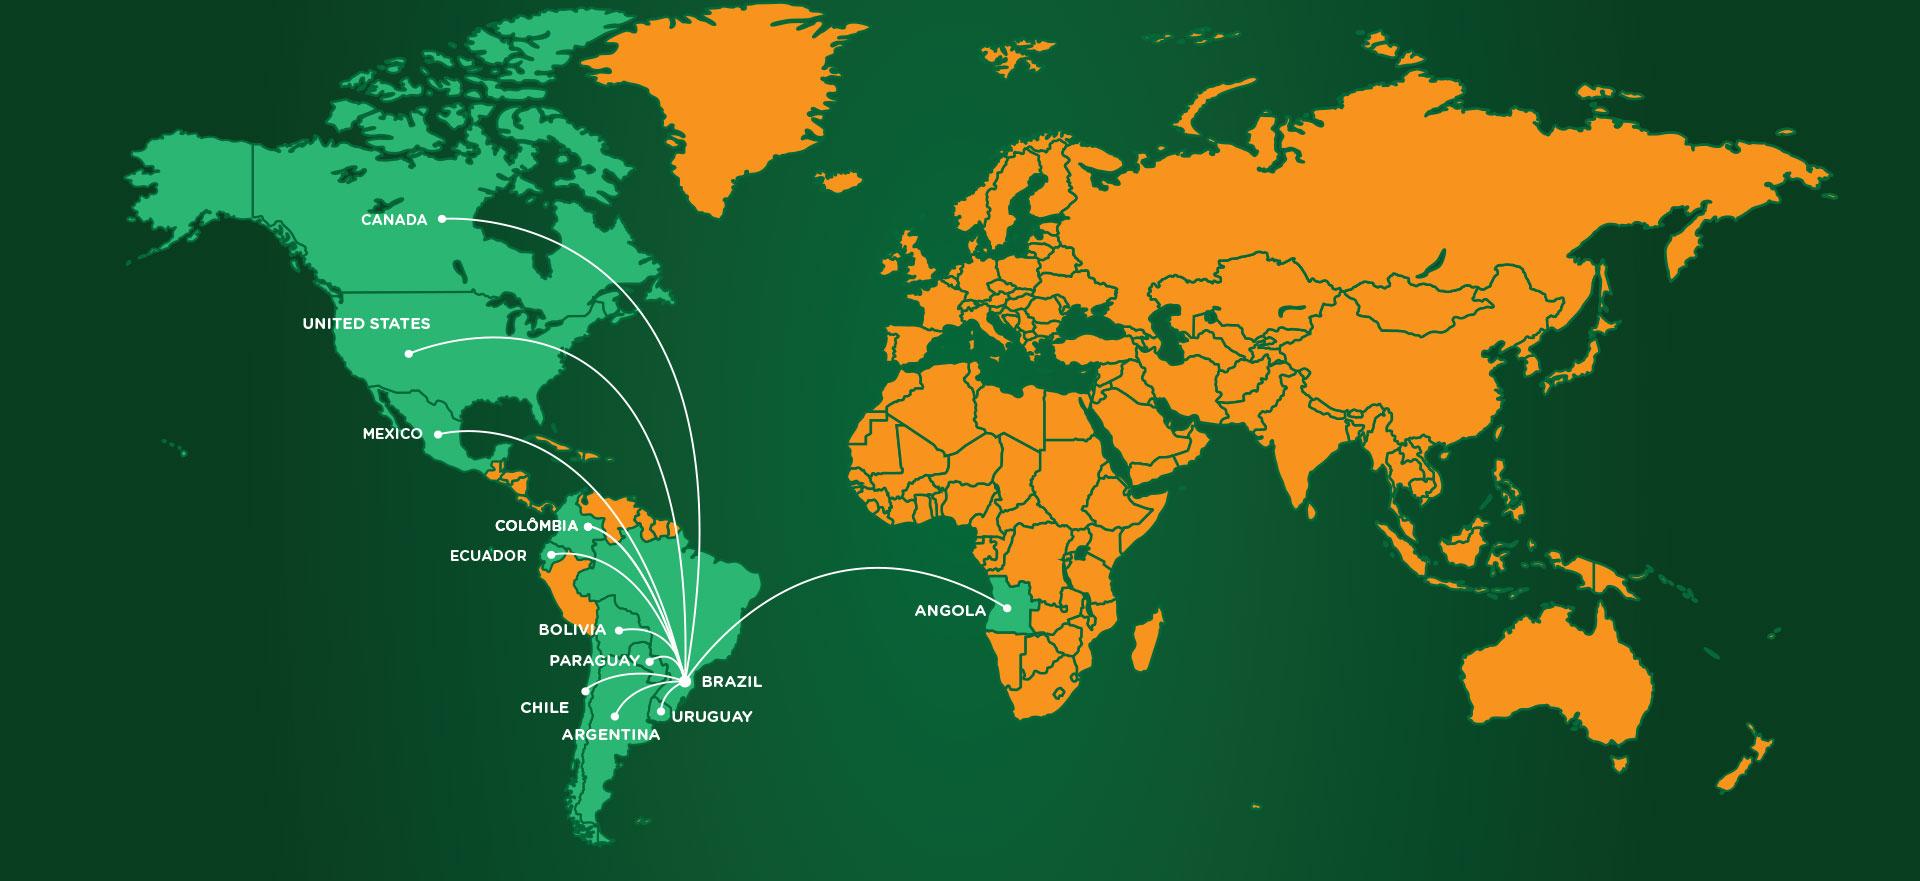 Worldwide J de Souza